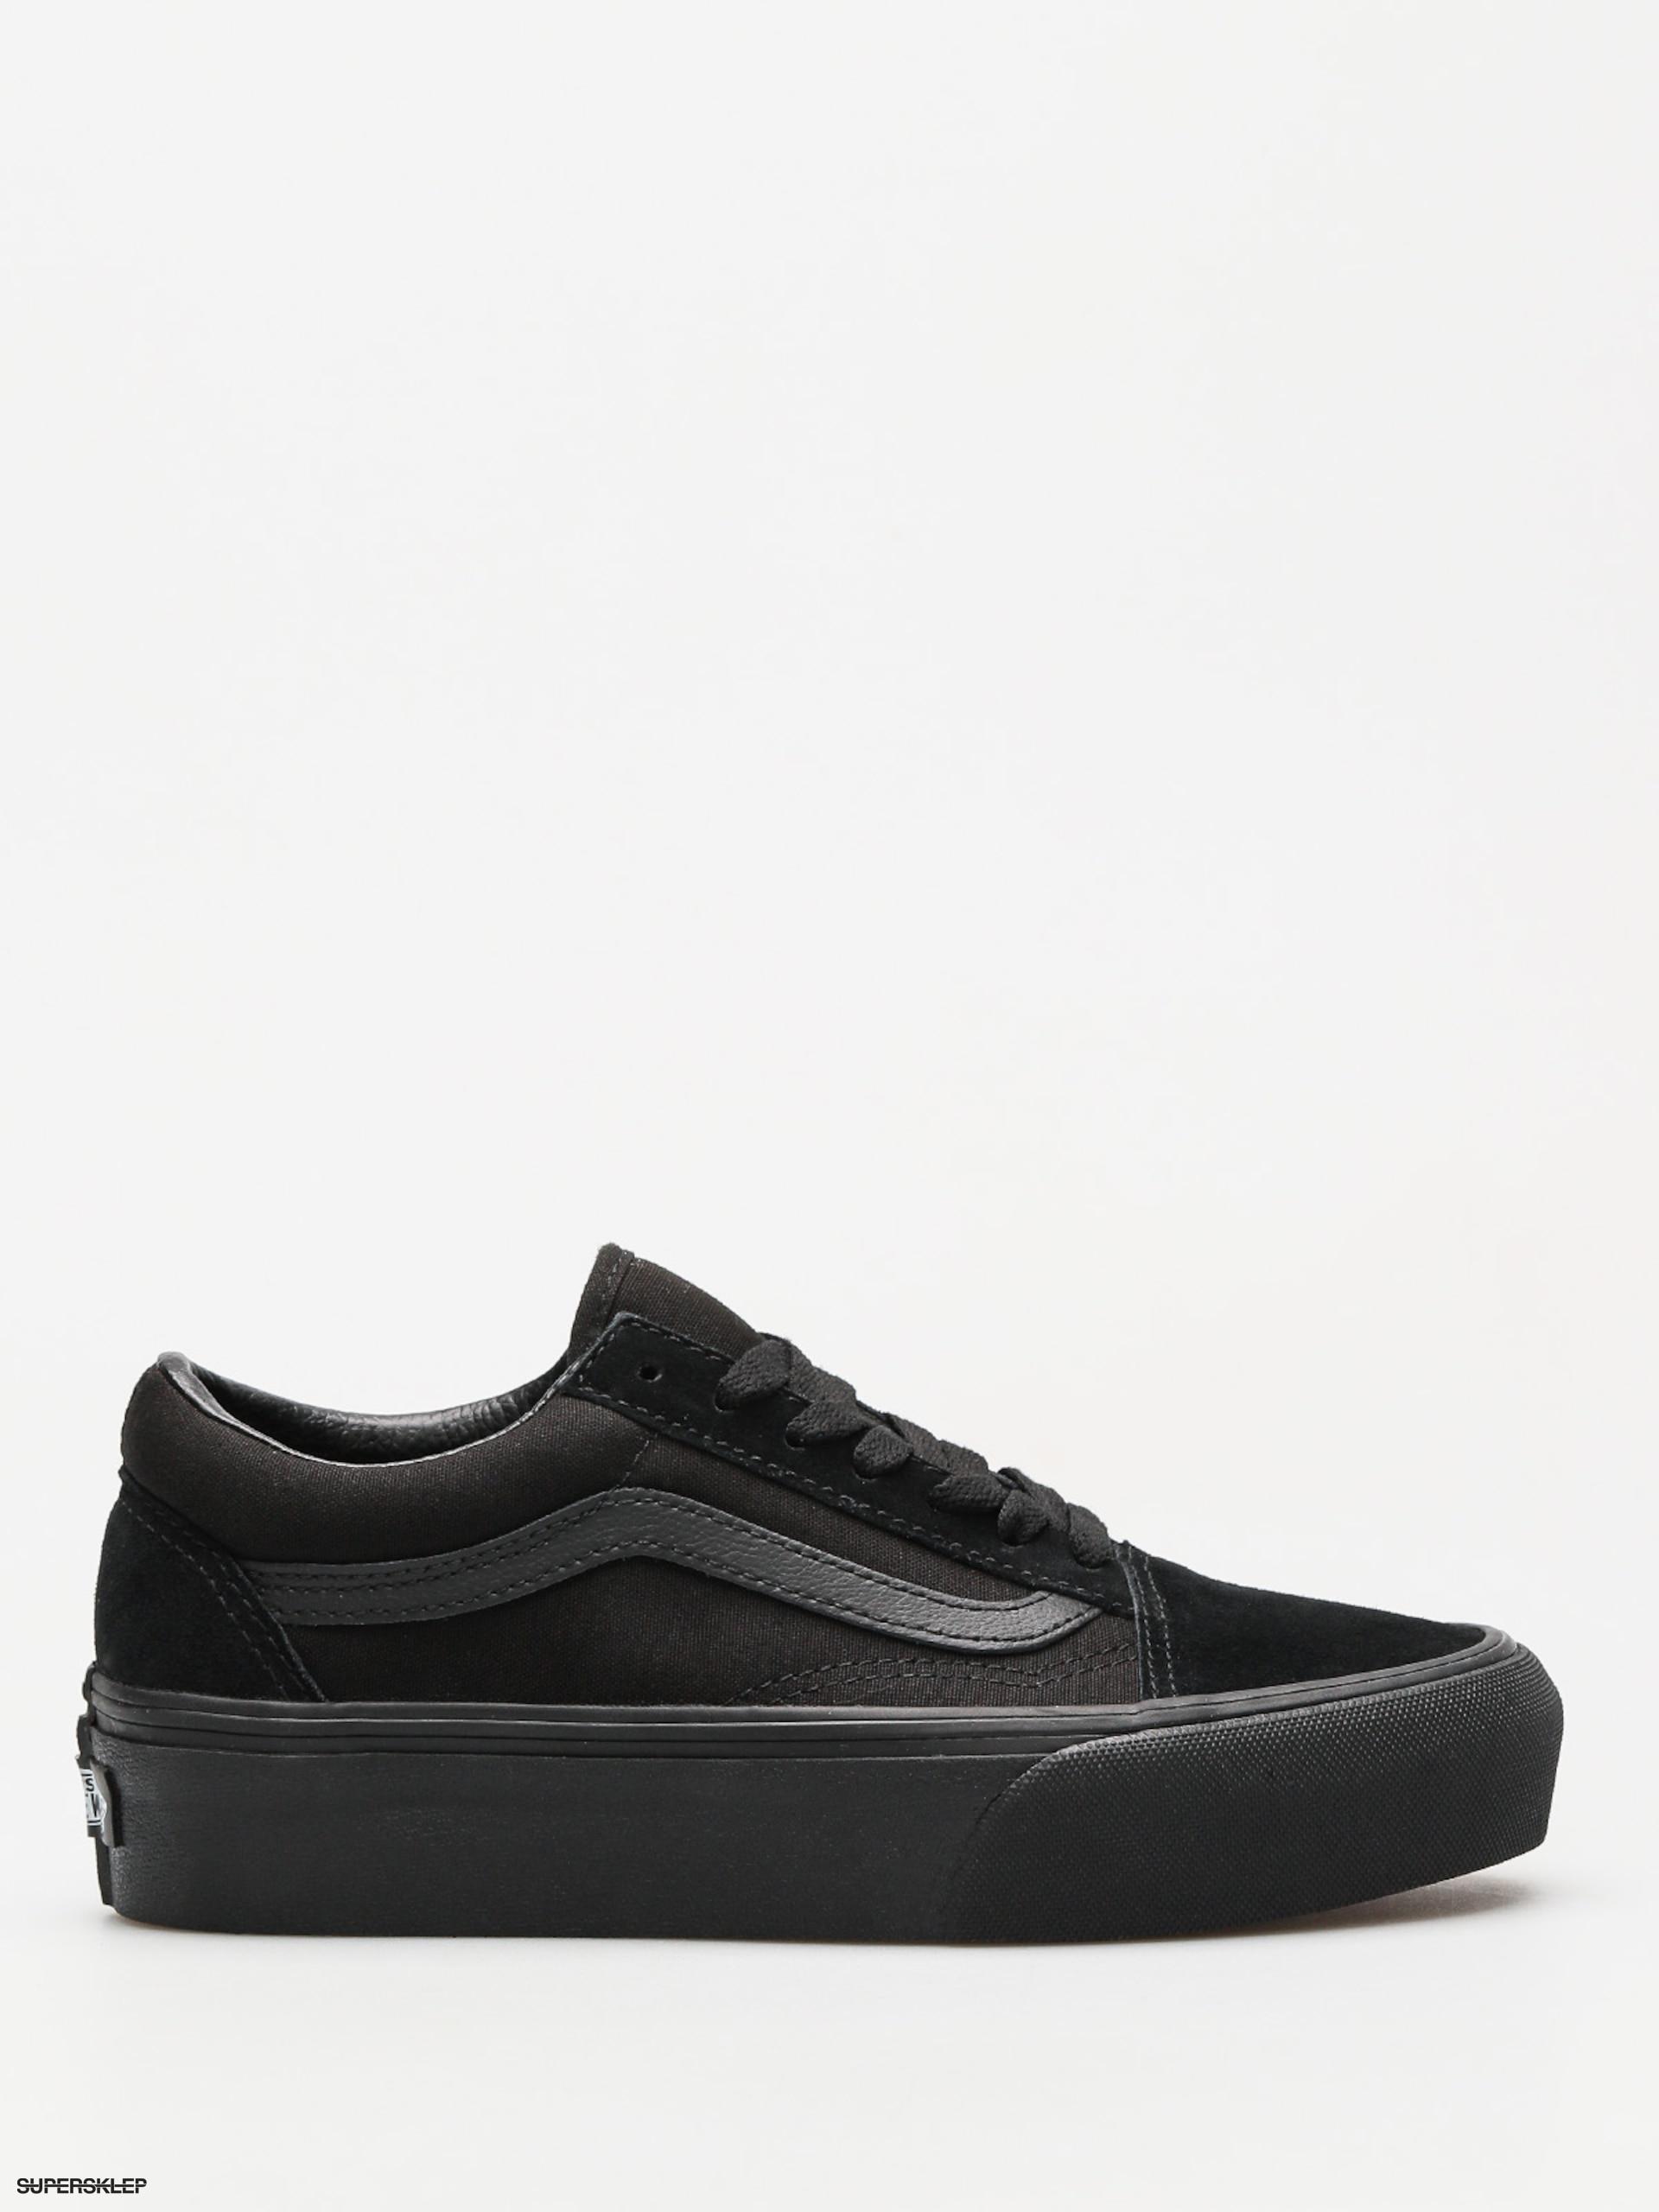 7f9370d971 Boty Vans Old Skool Platform (black black)